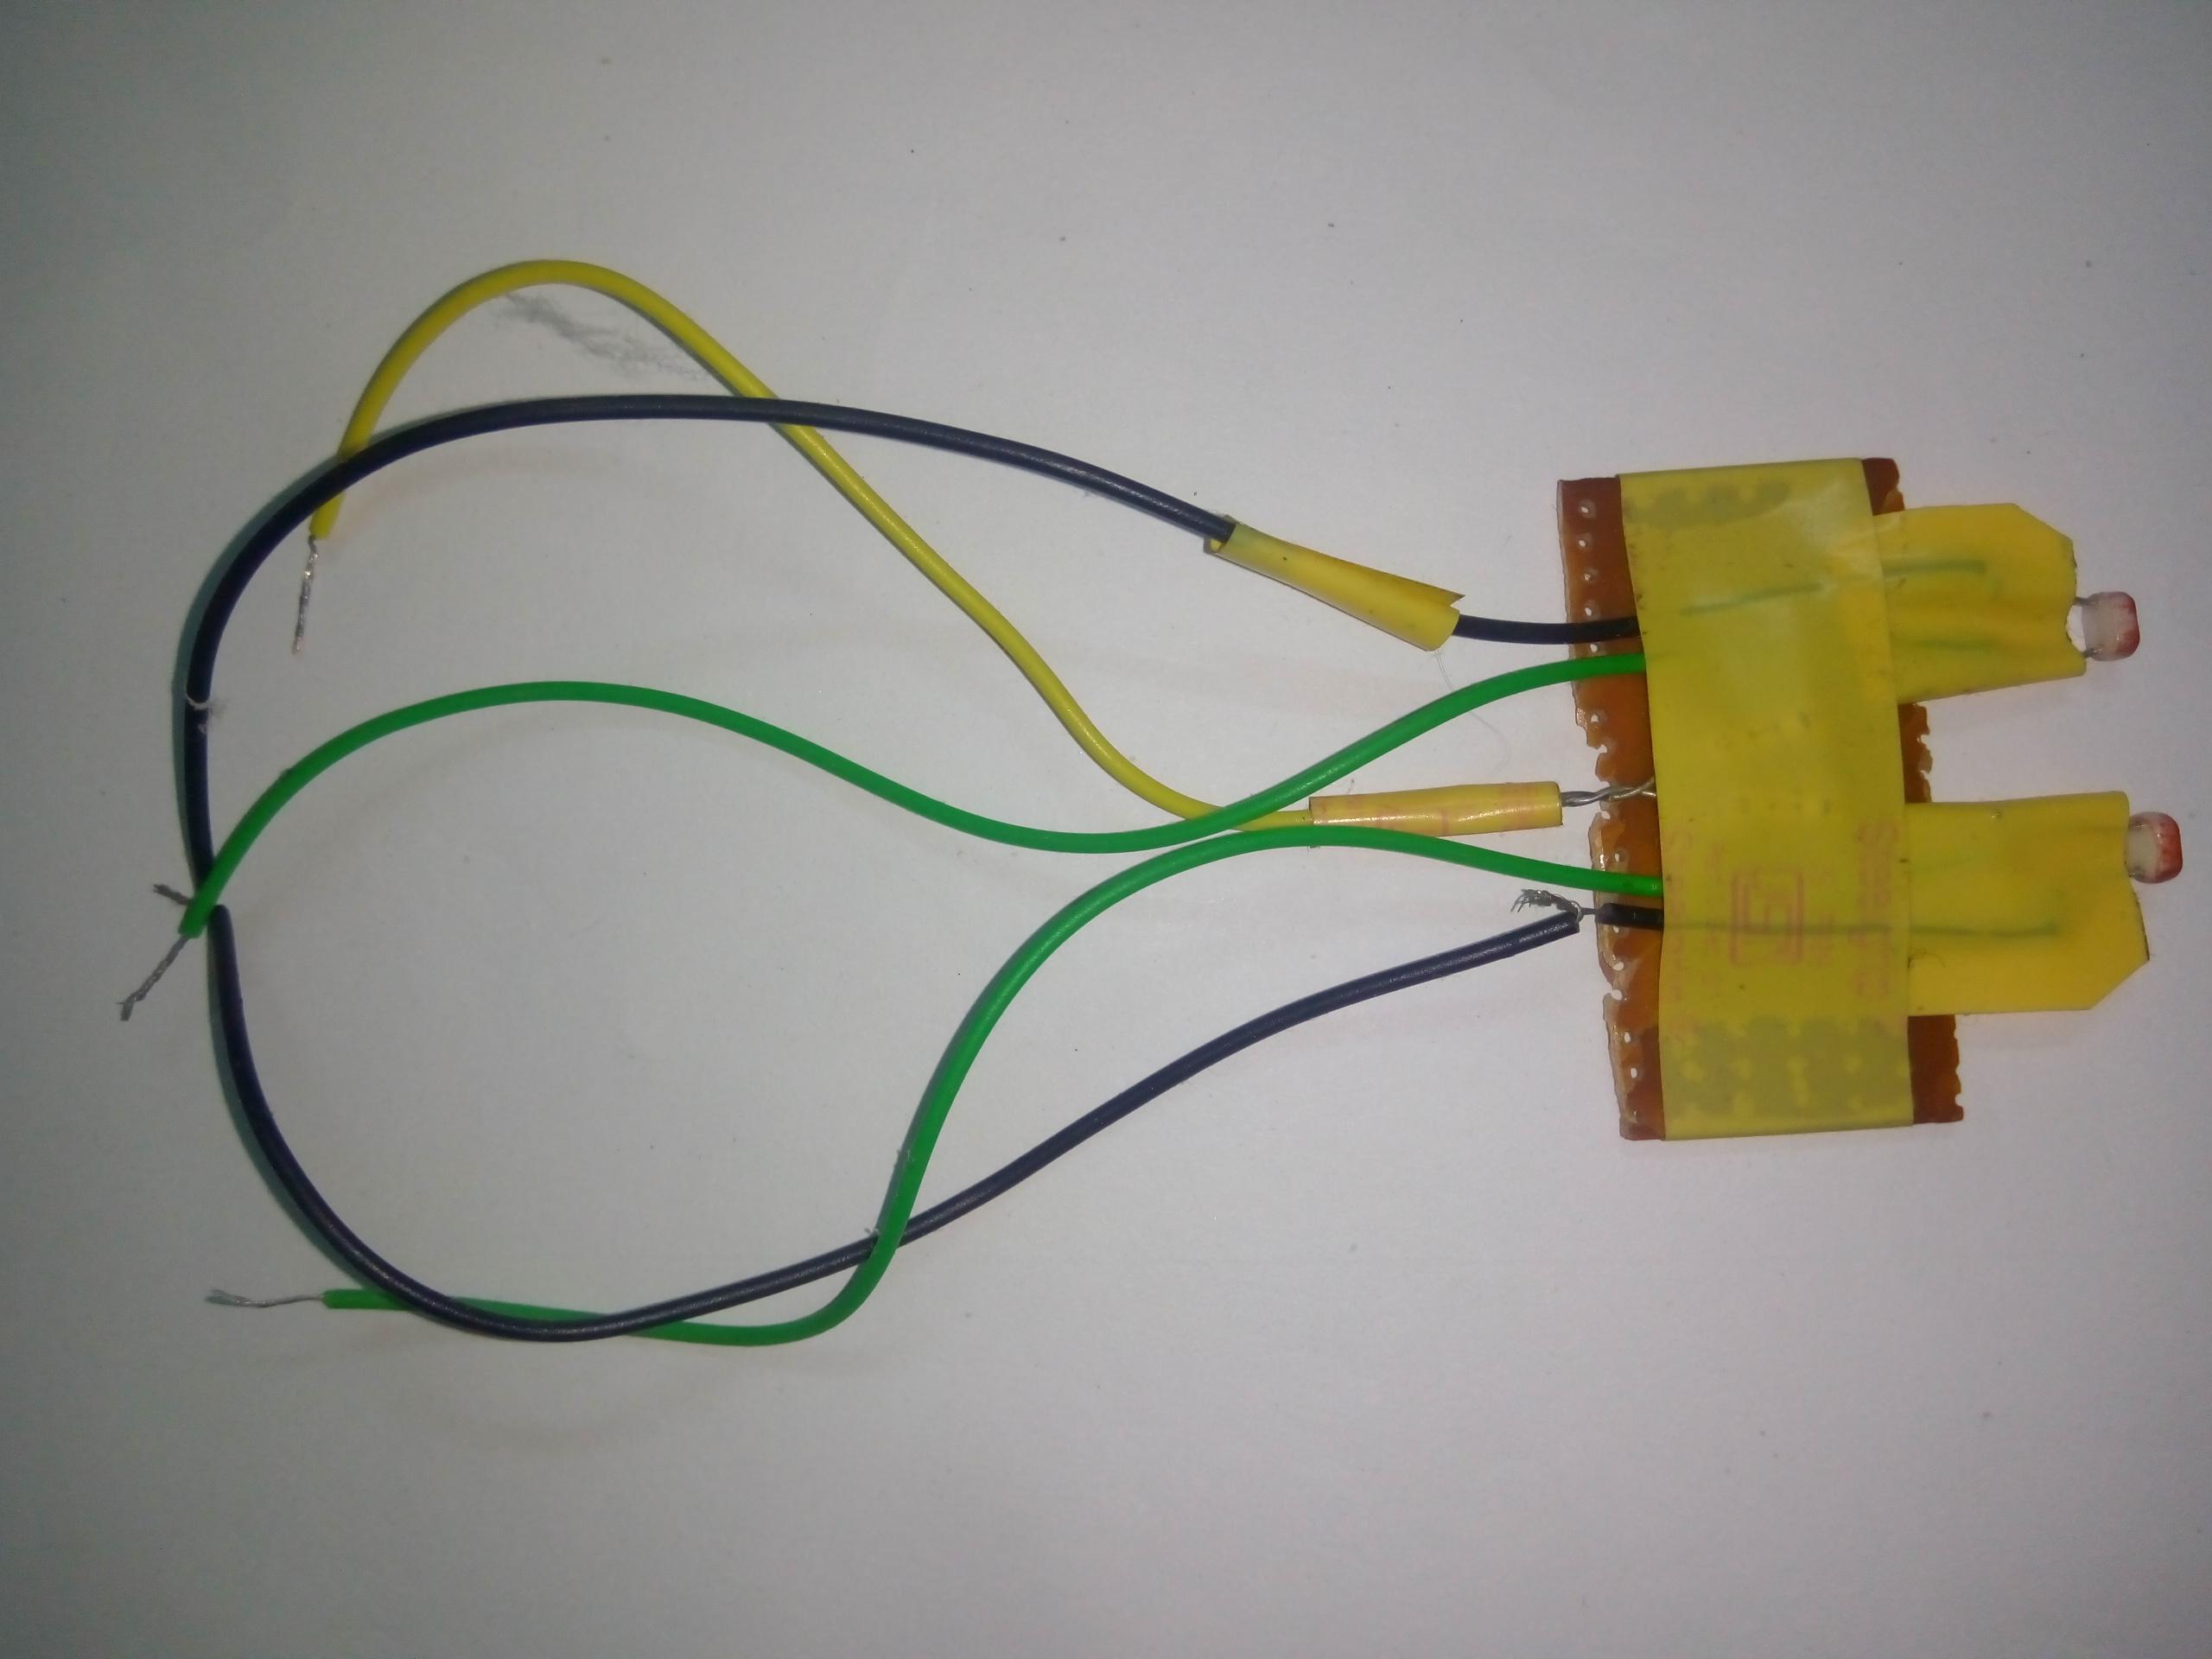 DIY Line Follower Sensor for Arduino Using LDR